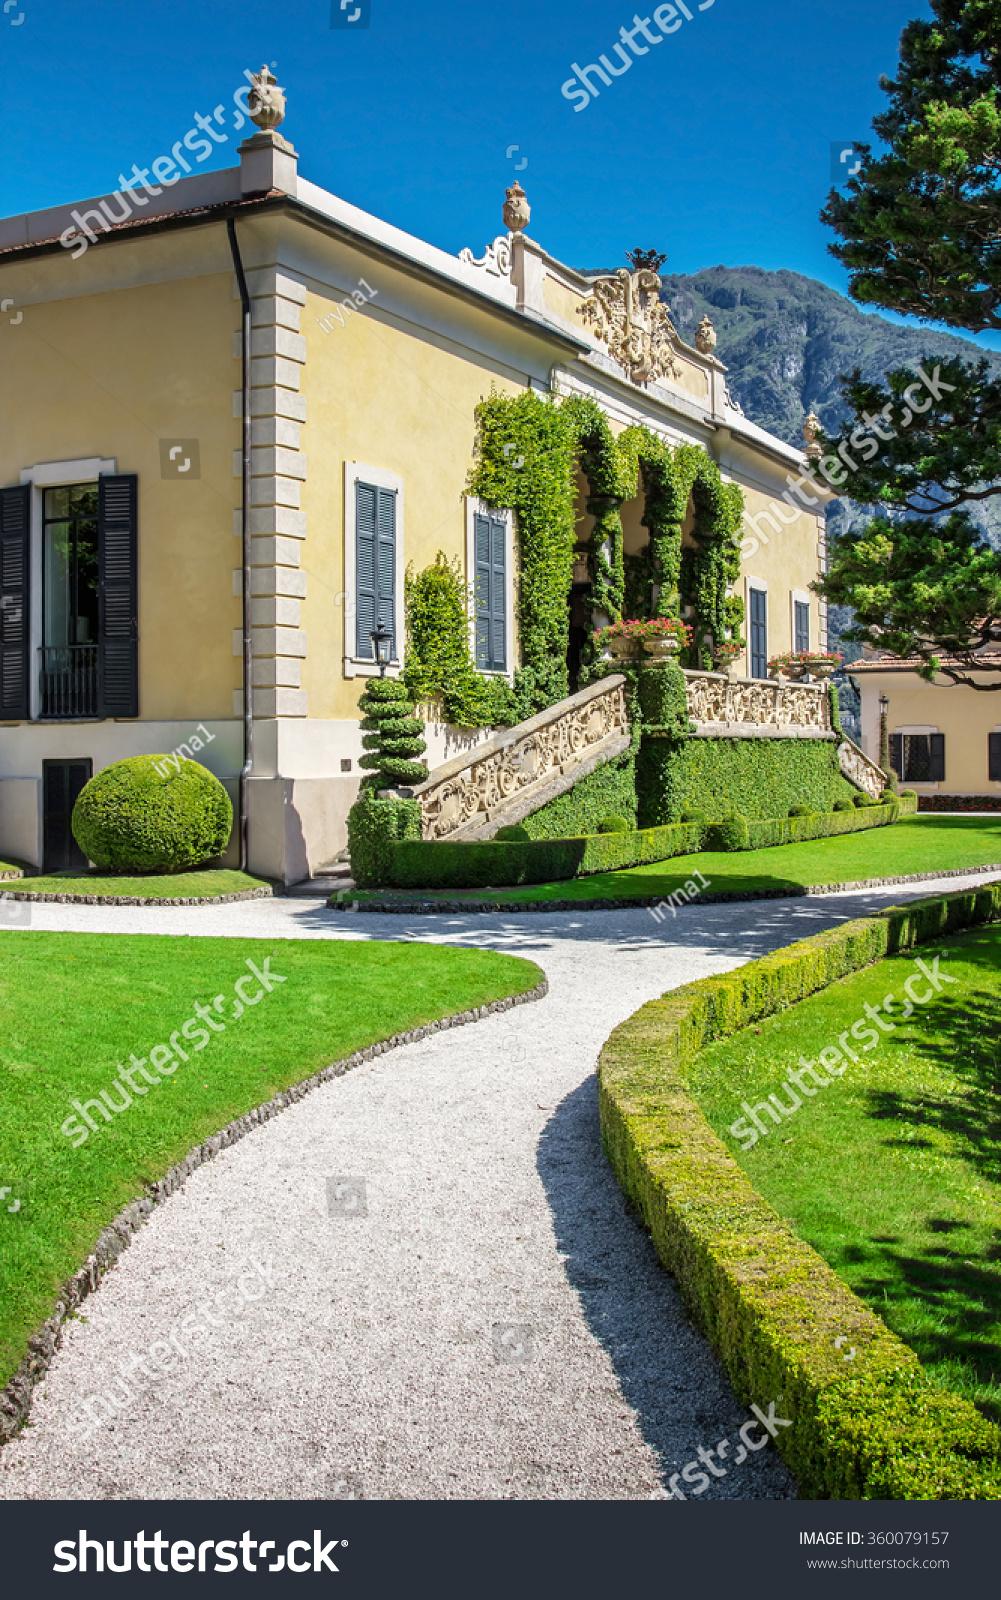 Villa balbianello italy august 02 2015 stock photo for Green italy